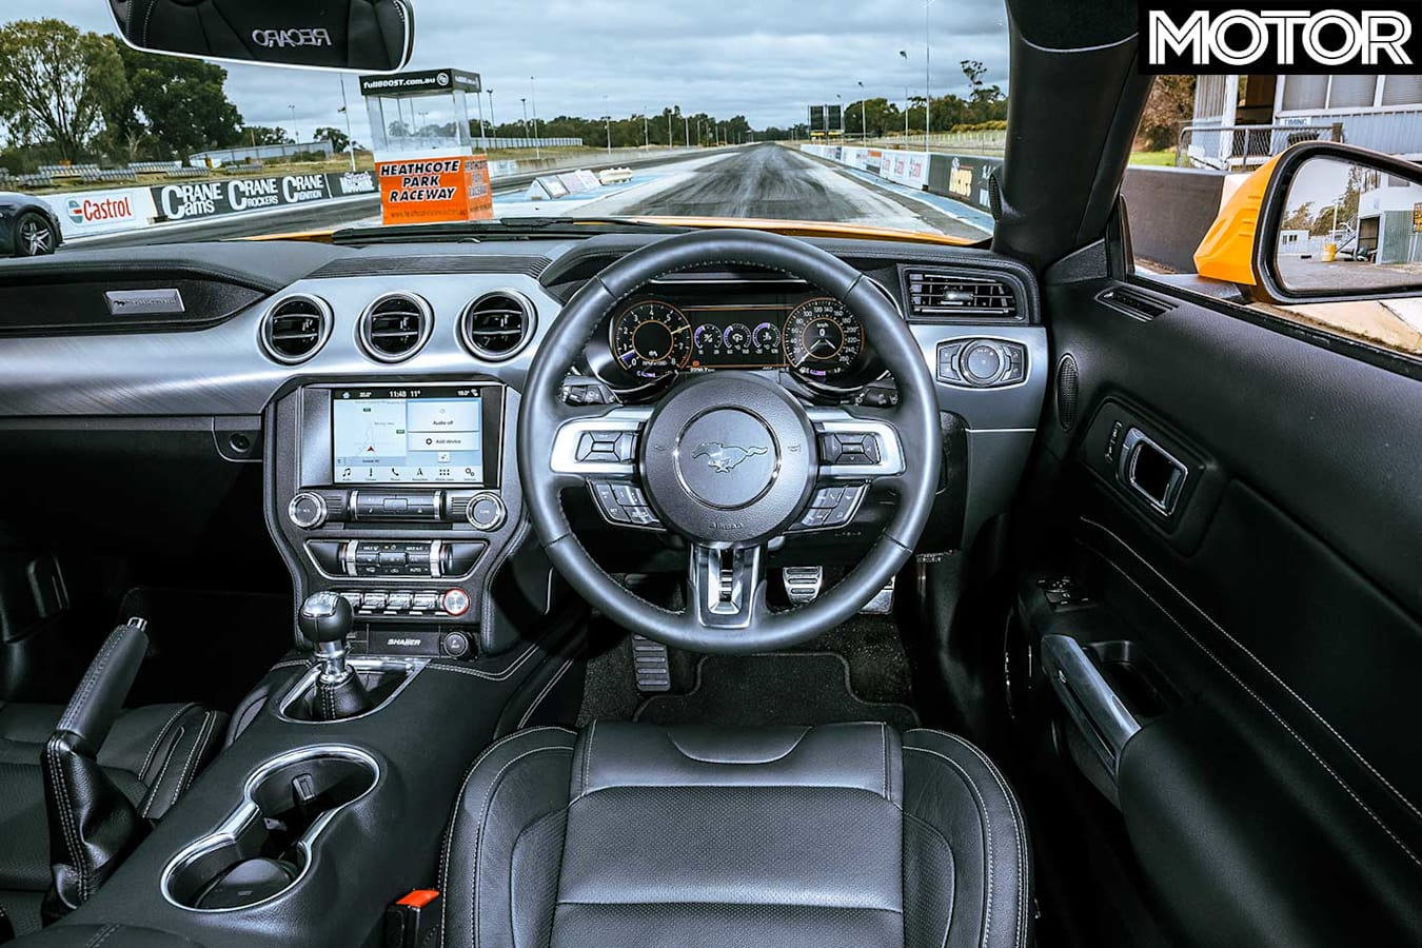 2018 Ford Mustang GT Dashboard Jpg